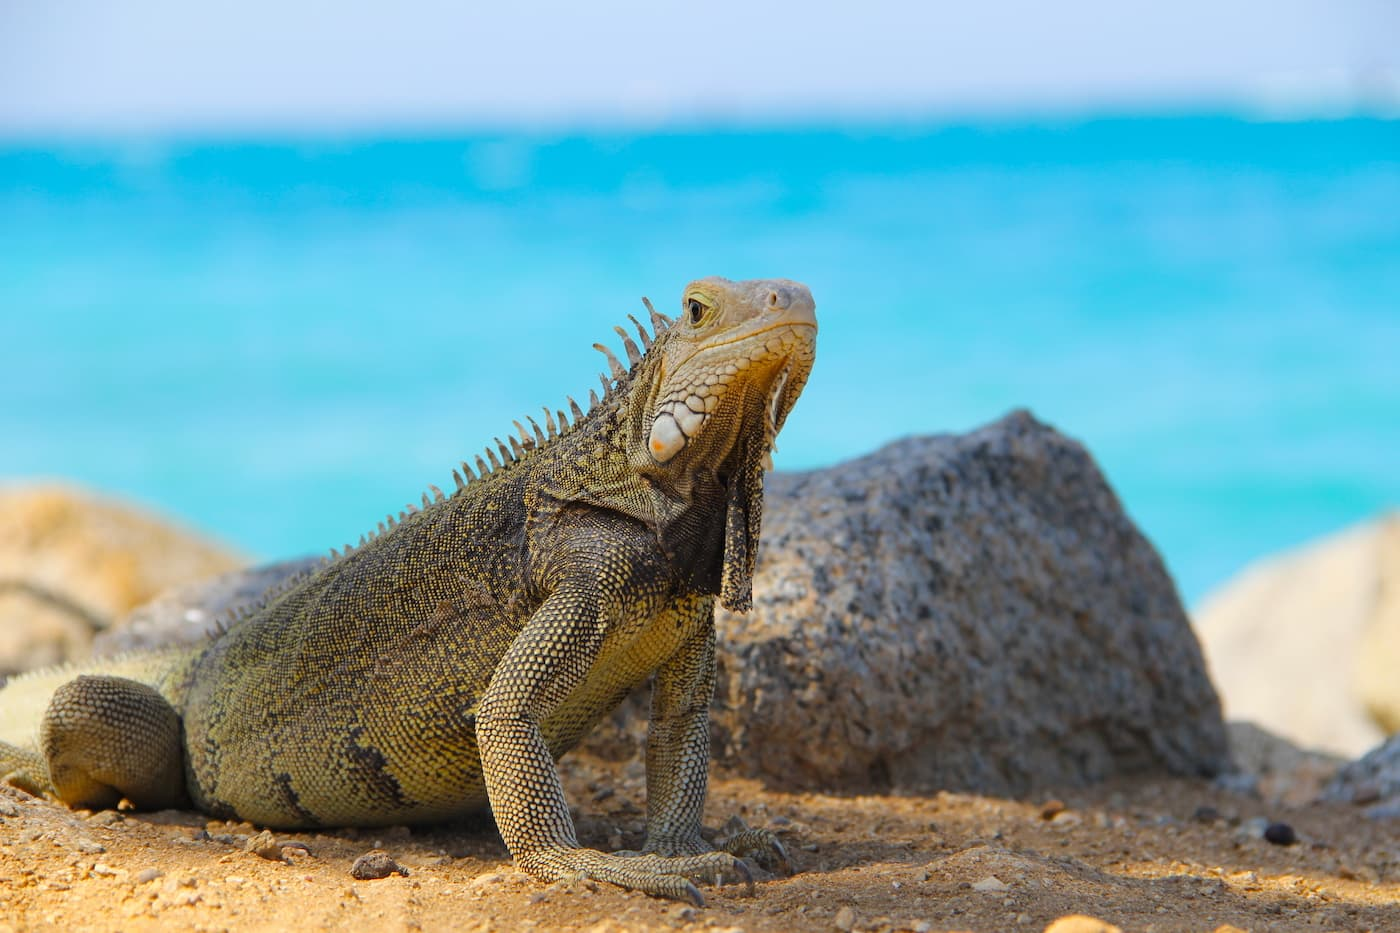 an iguana on a beach in Aruba in the Dutch Caribbean